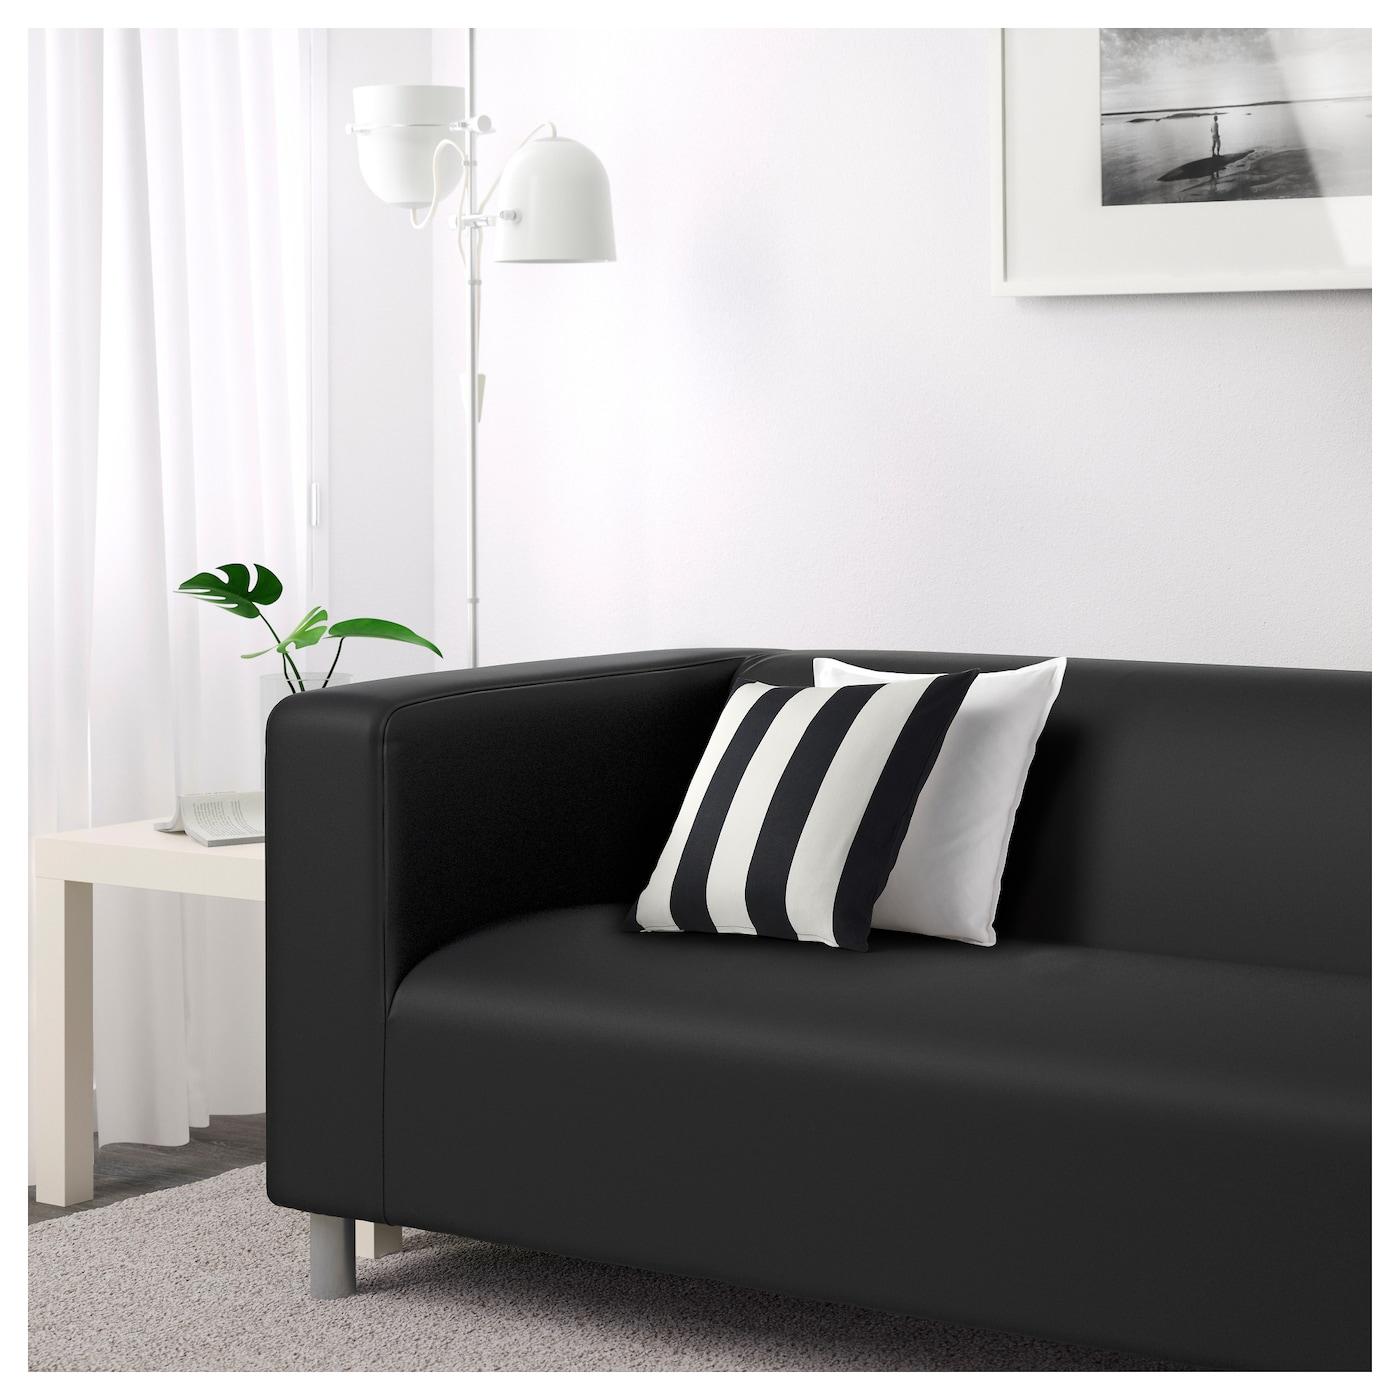 Schlafsofa ikea  KLIPPAN Two-seat sofa Granån black - IKEA